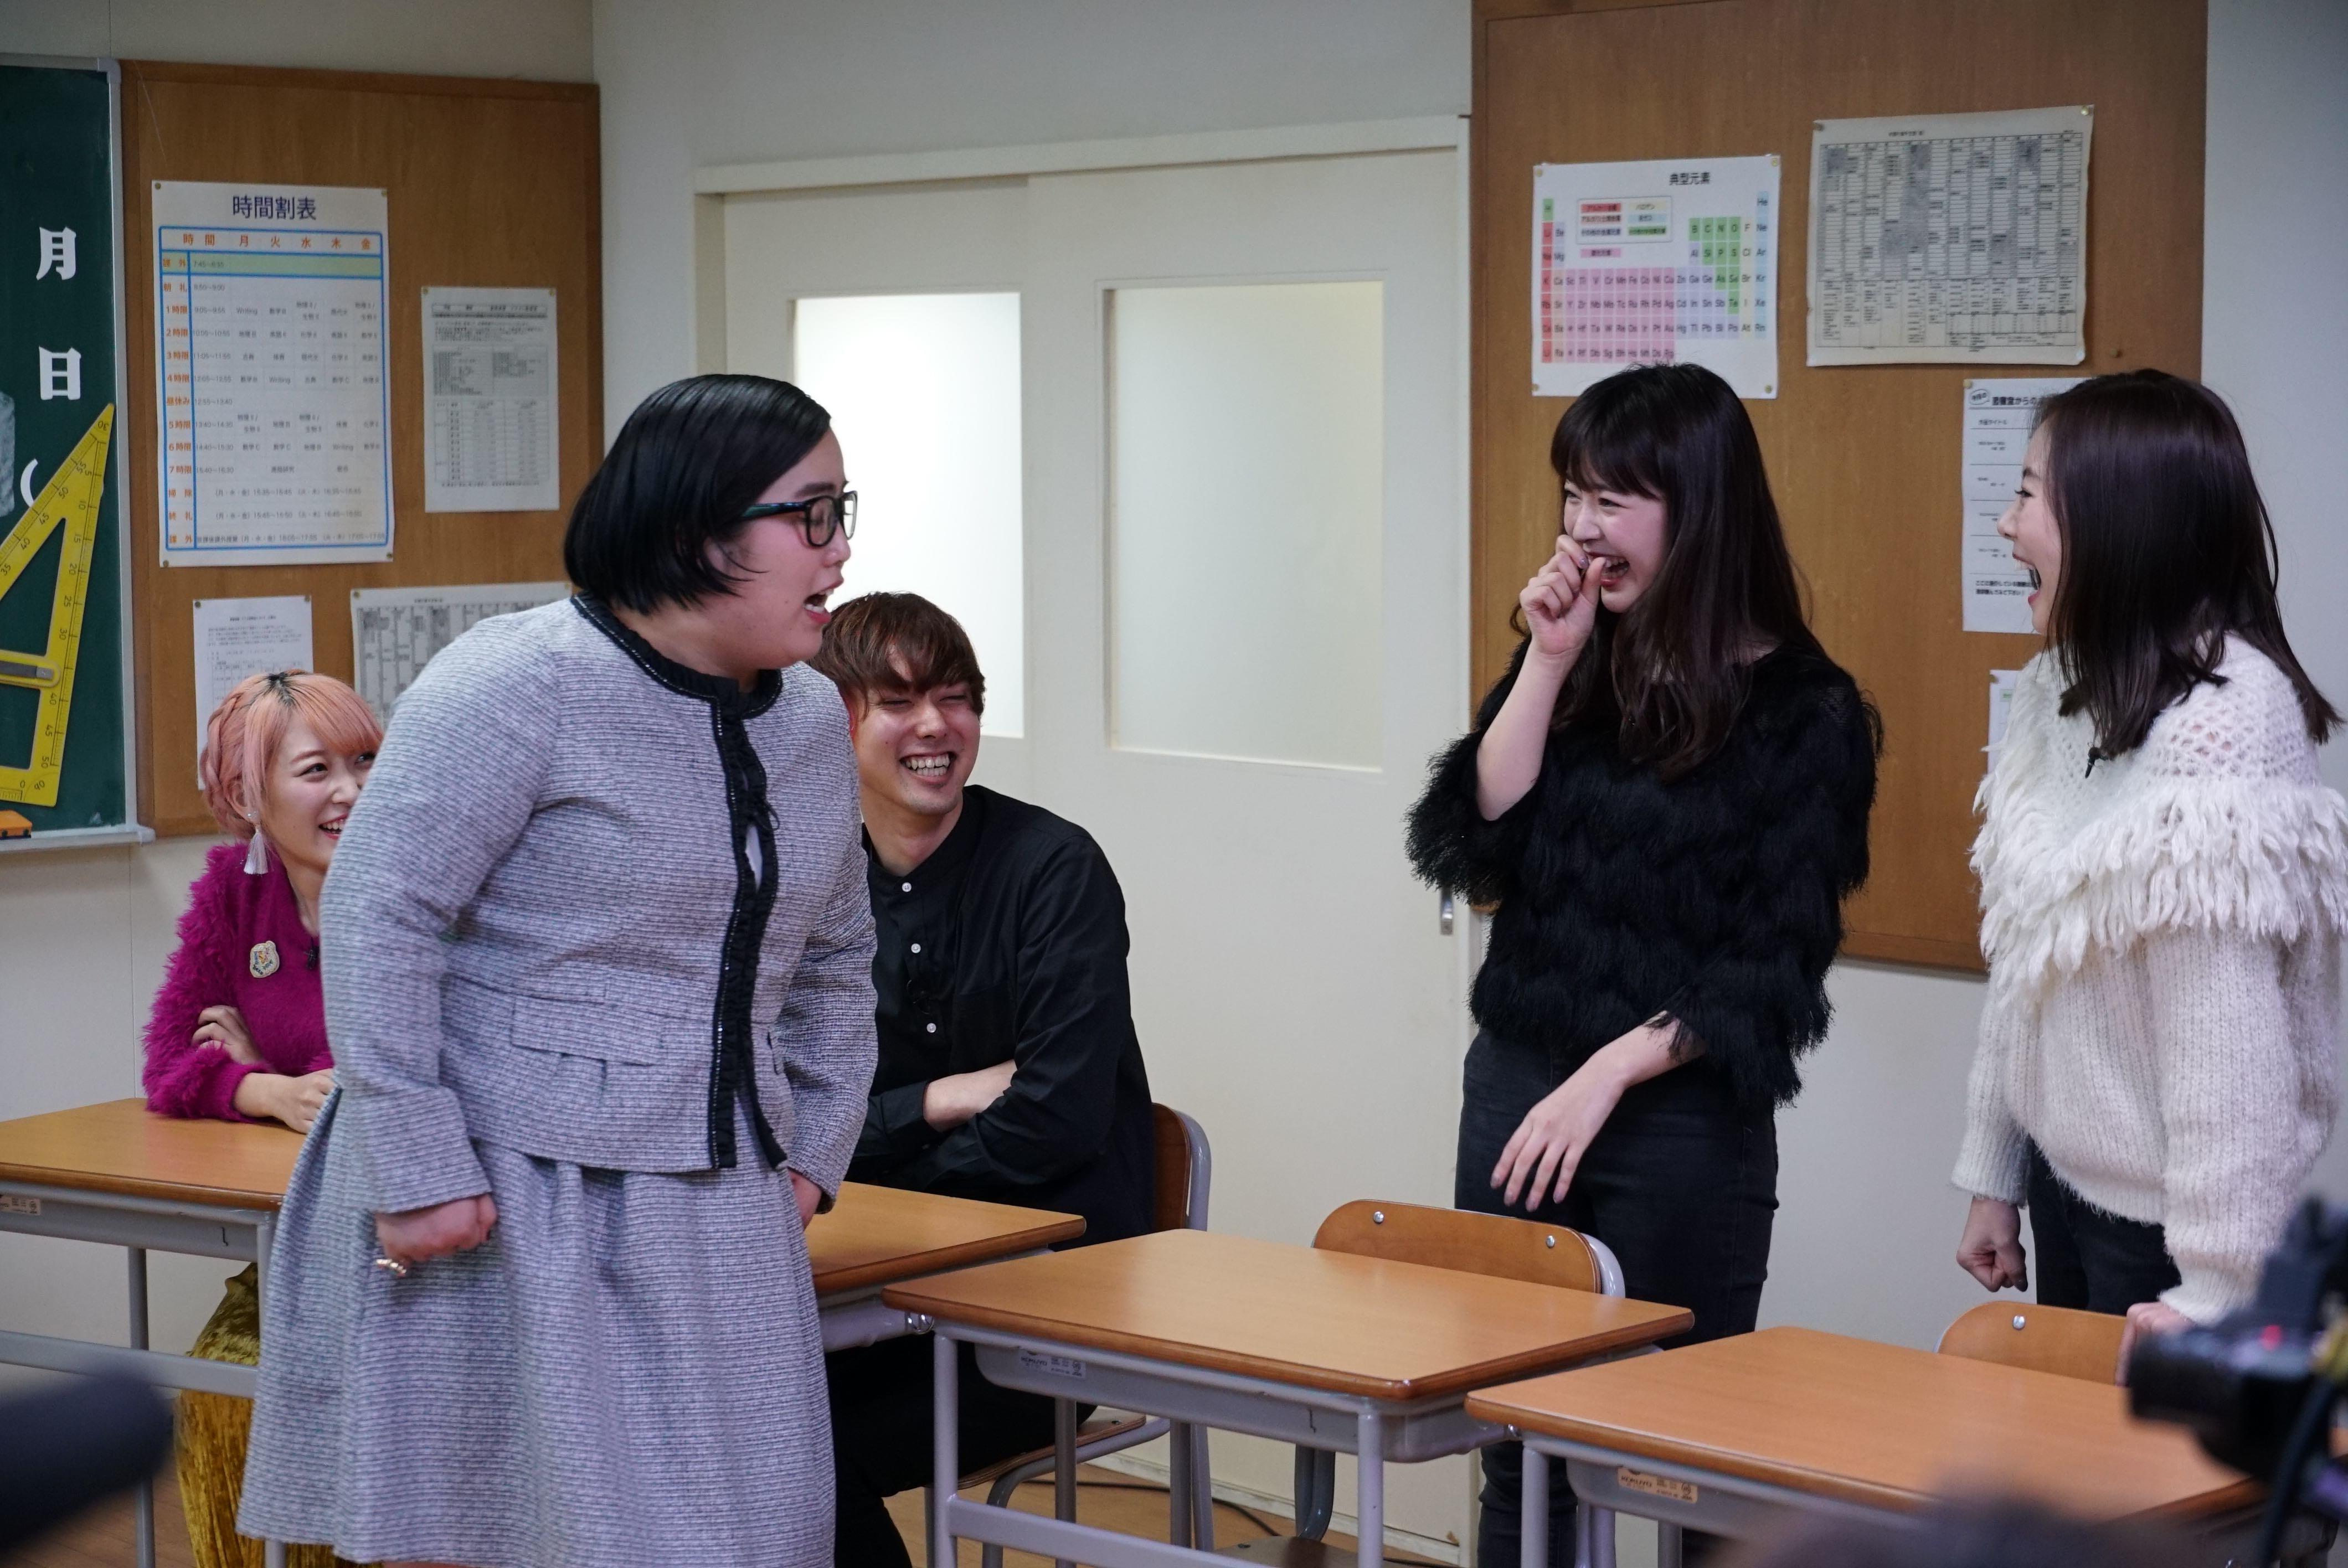 http://news.yoshimoto.co.jp/20180311071715-dbd388217a910925509ccb25e3de9f3c53ceda52.jpg